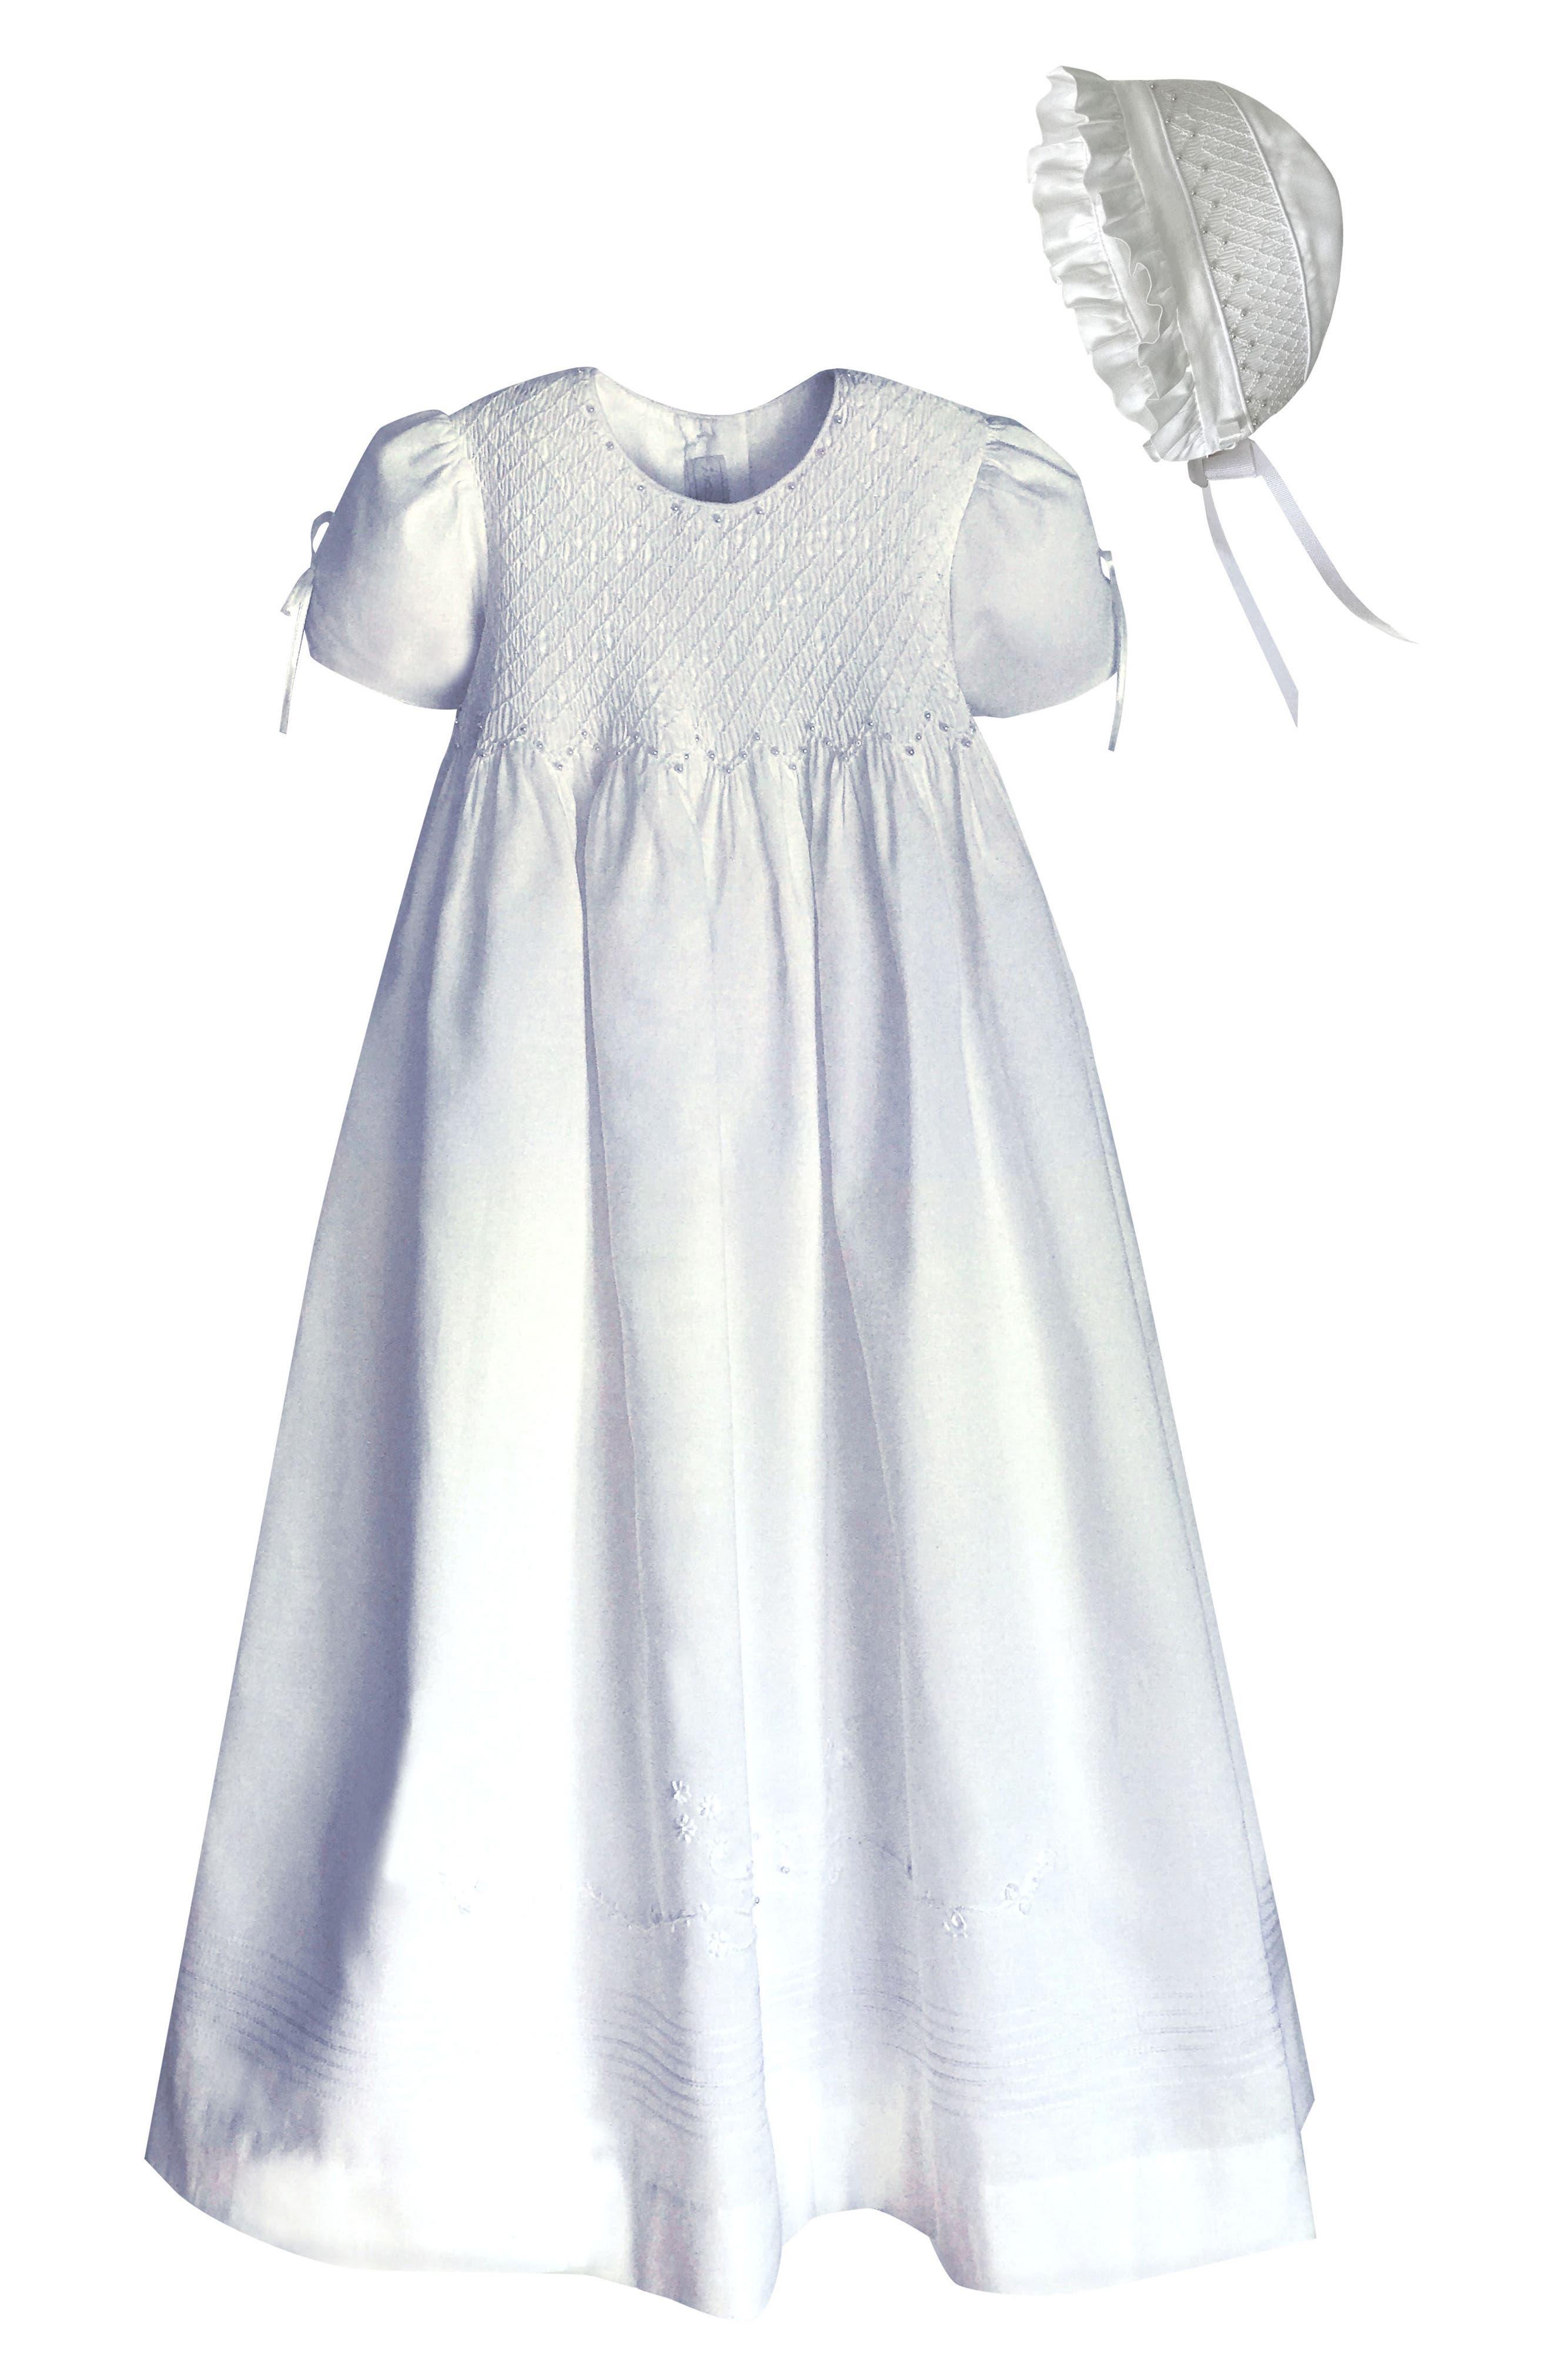 Alternate Image 1 Selected - Isabel Garreton 'Pearls' Christening Gown & Bonnet (Baby)